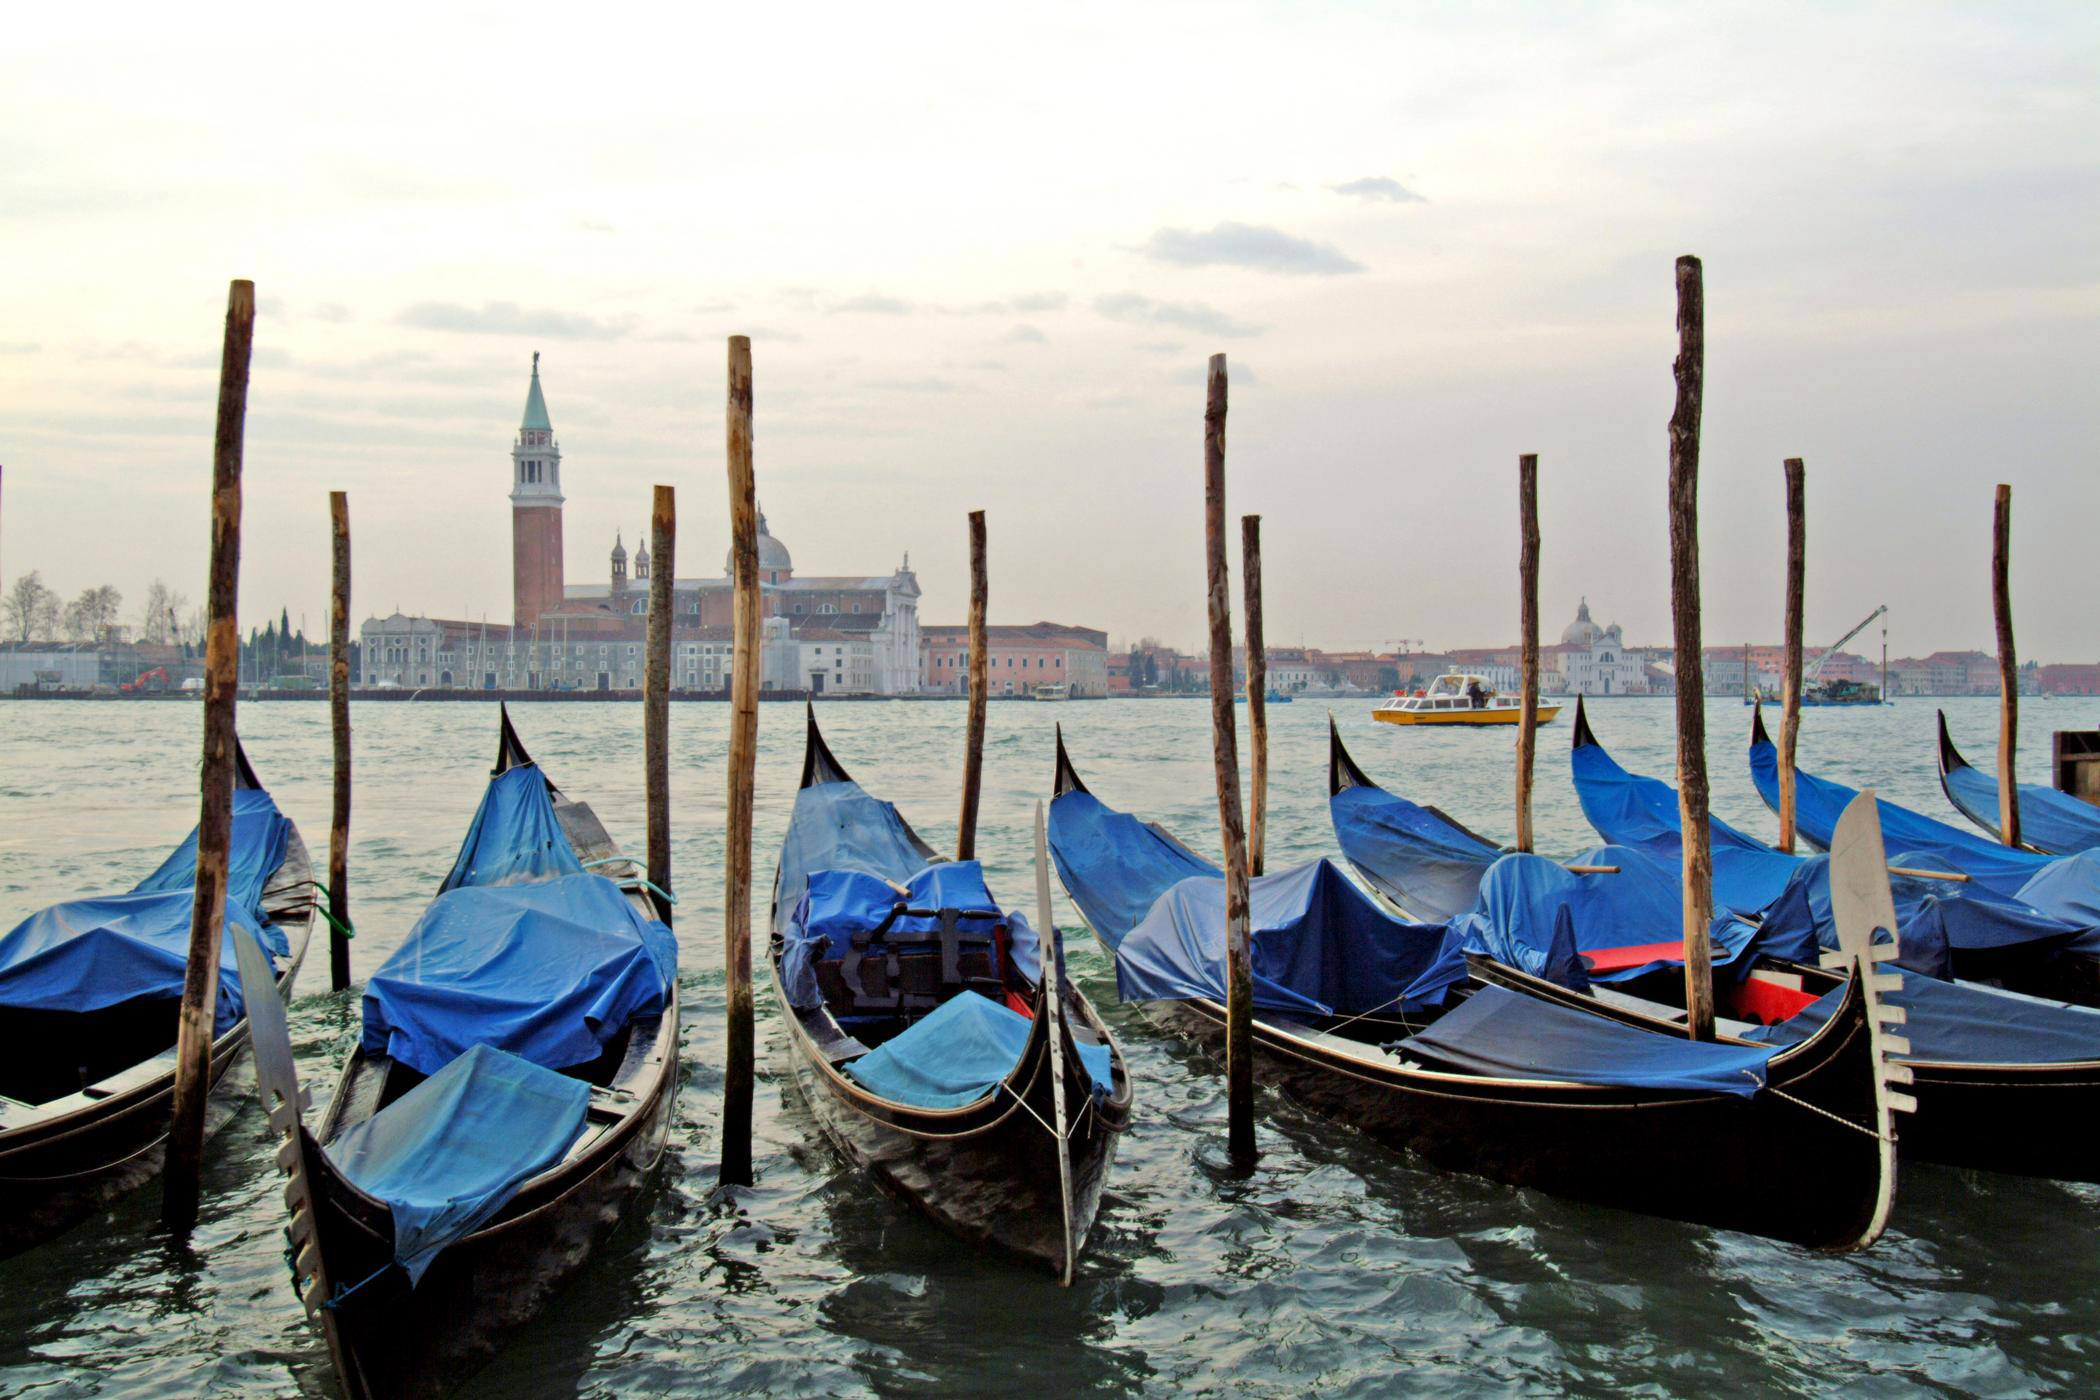 spg-explore-italy-venice-gondola-ride